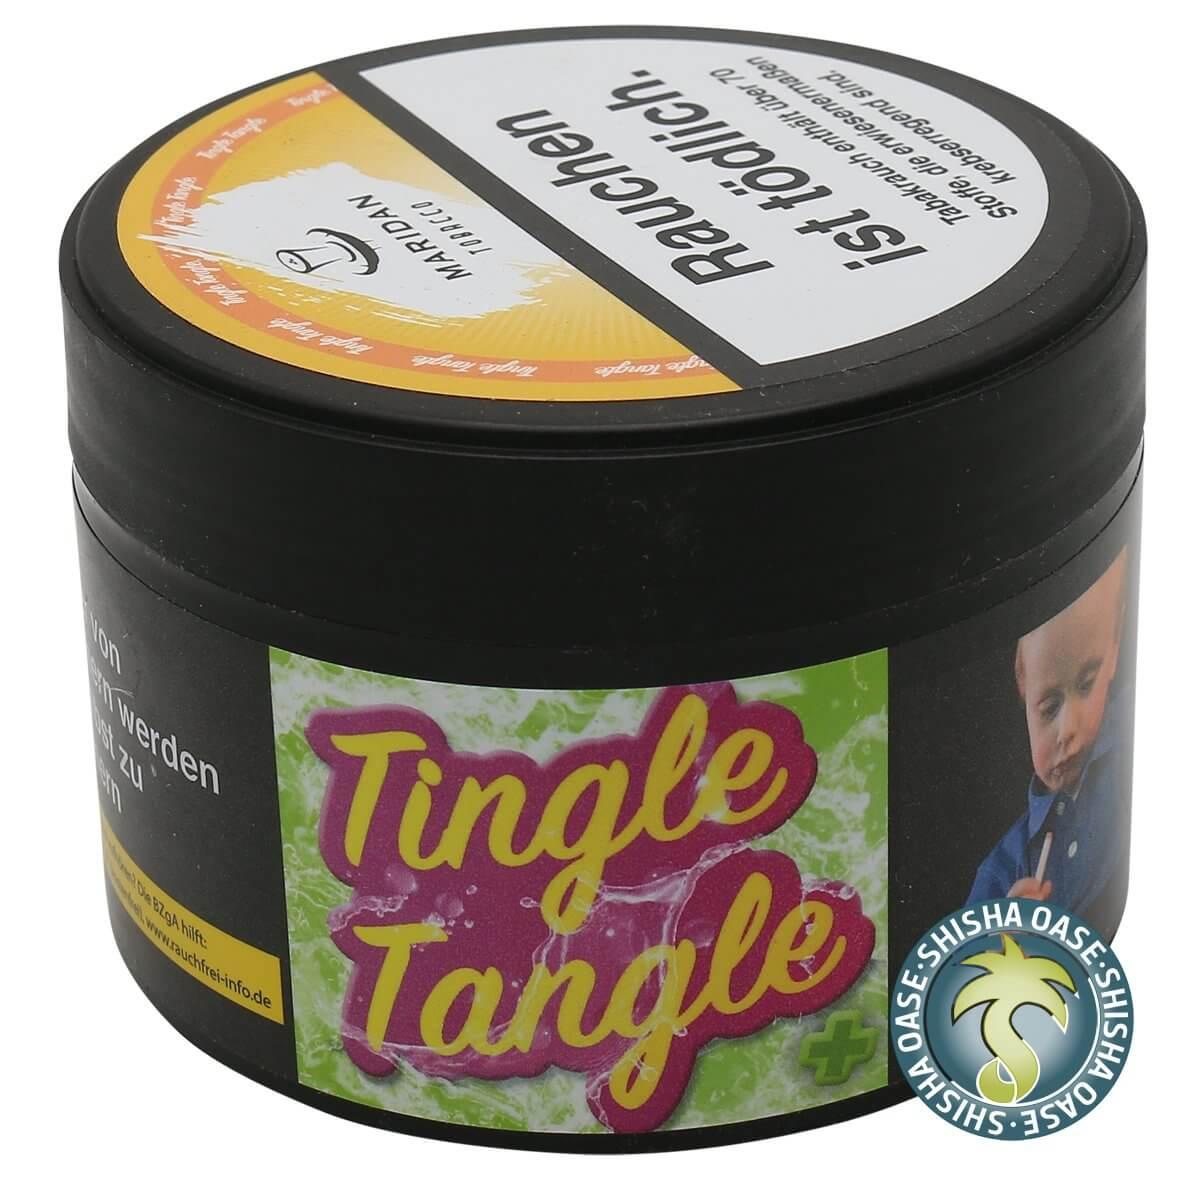 Maridan Tabak 200g Dose - Tingle Tangle